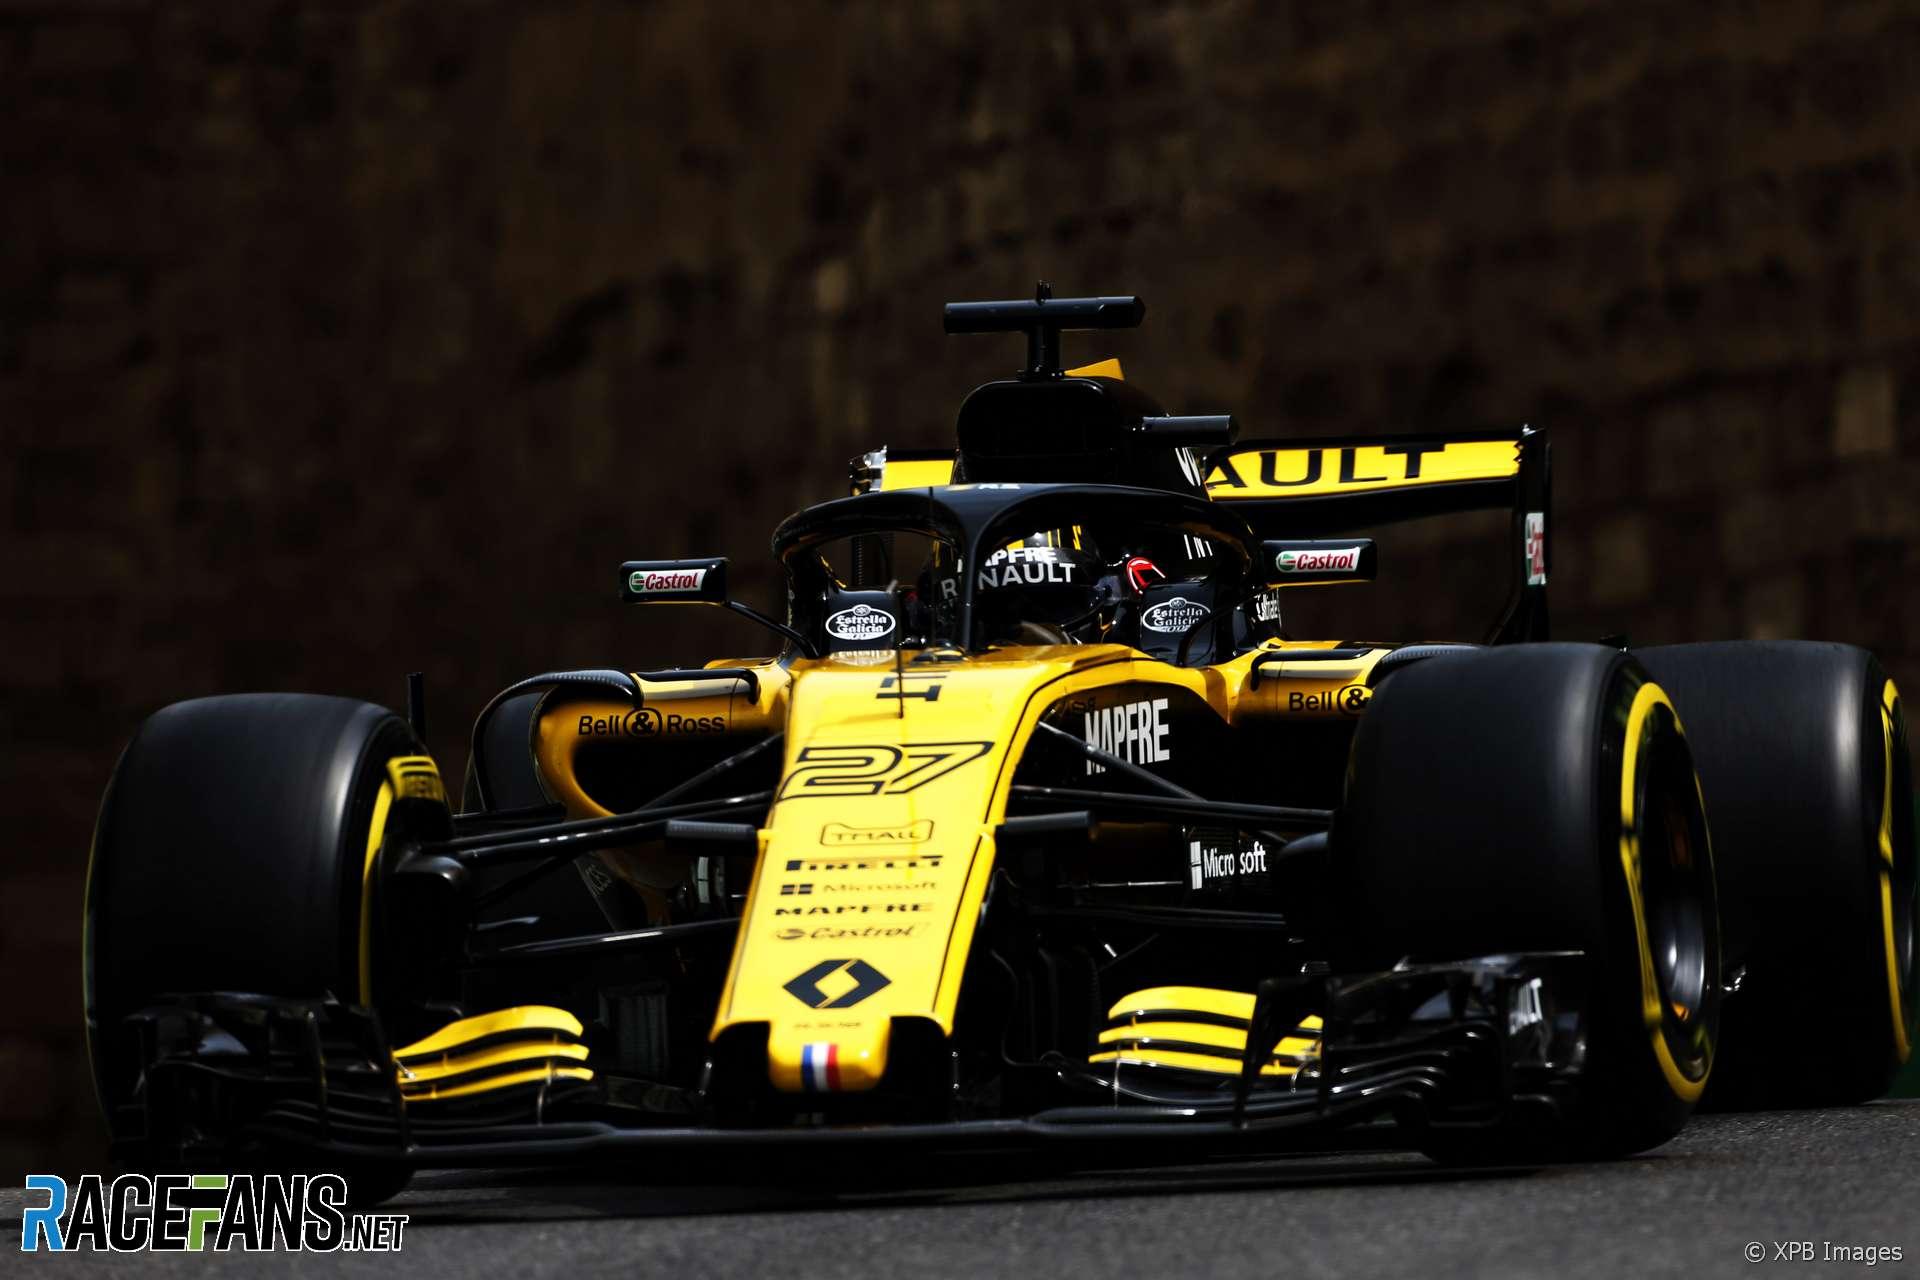 Nico Hulkenberg, Renault, Baku City Circuit, 2018